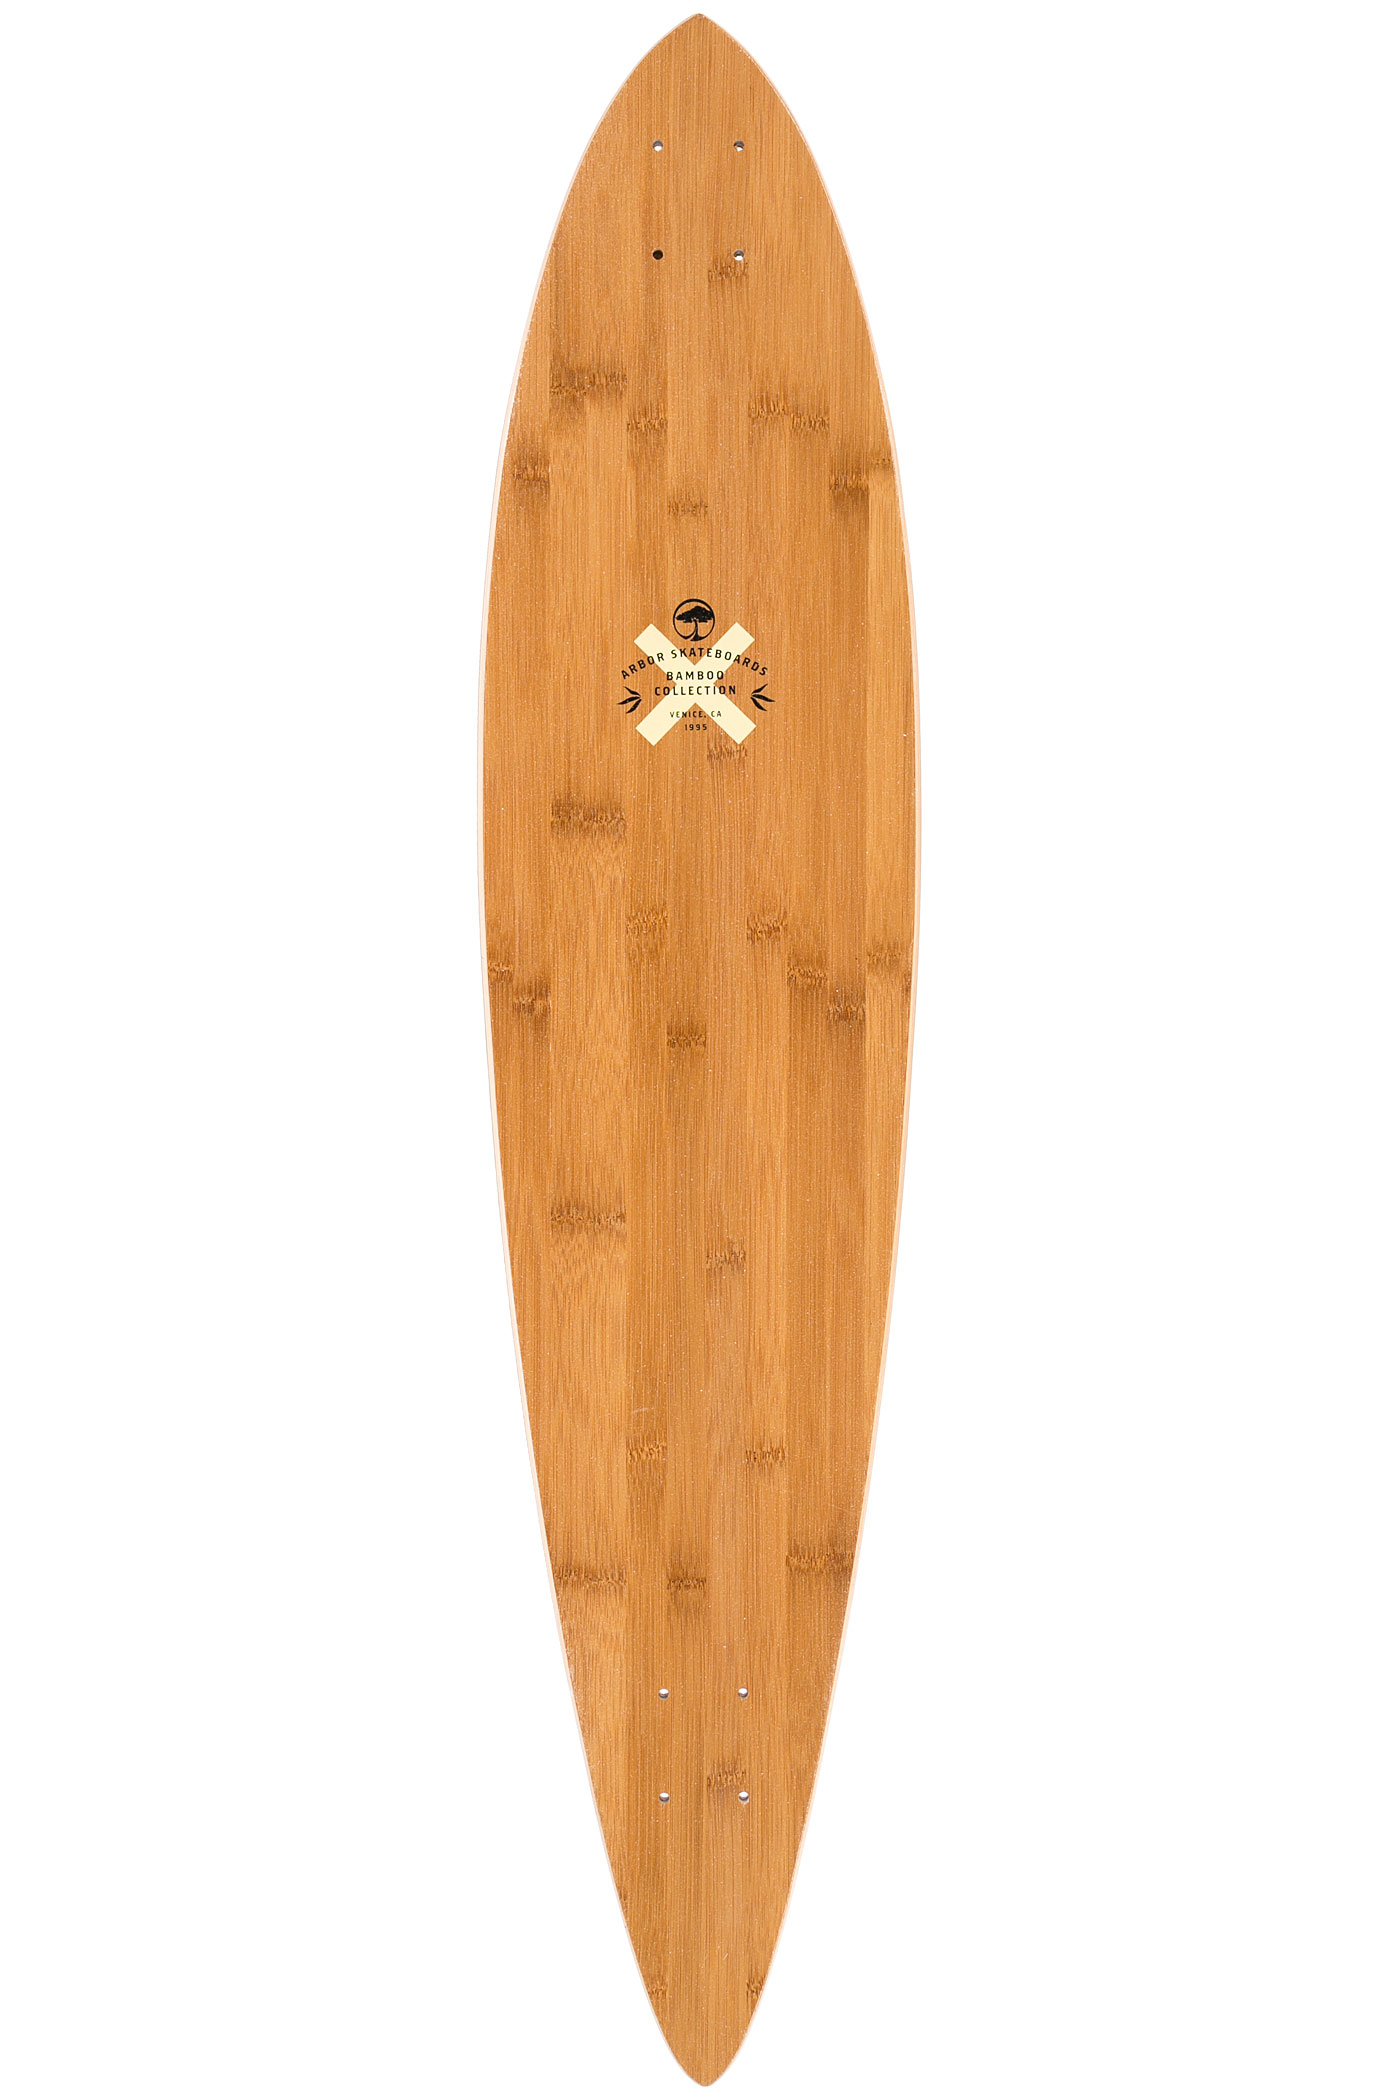 arbor timeless bamboo 42 106 7cm longboard deck kaufen. Black Bedroom Furniture Sets. Home Design Ideas